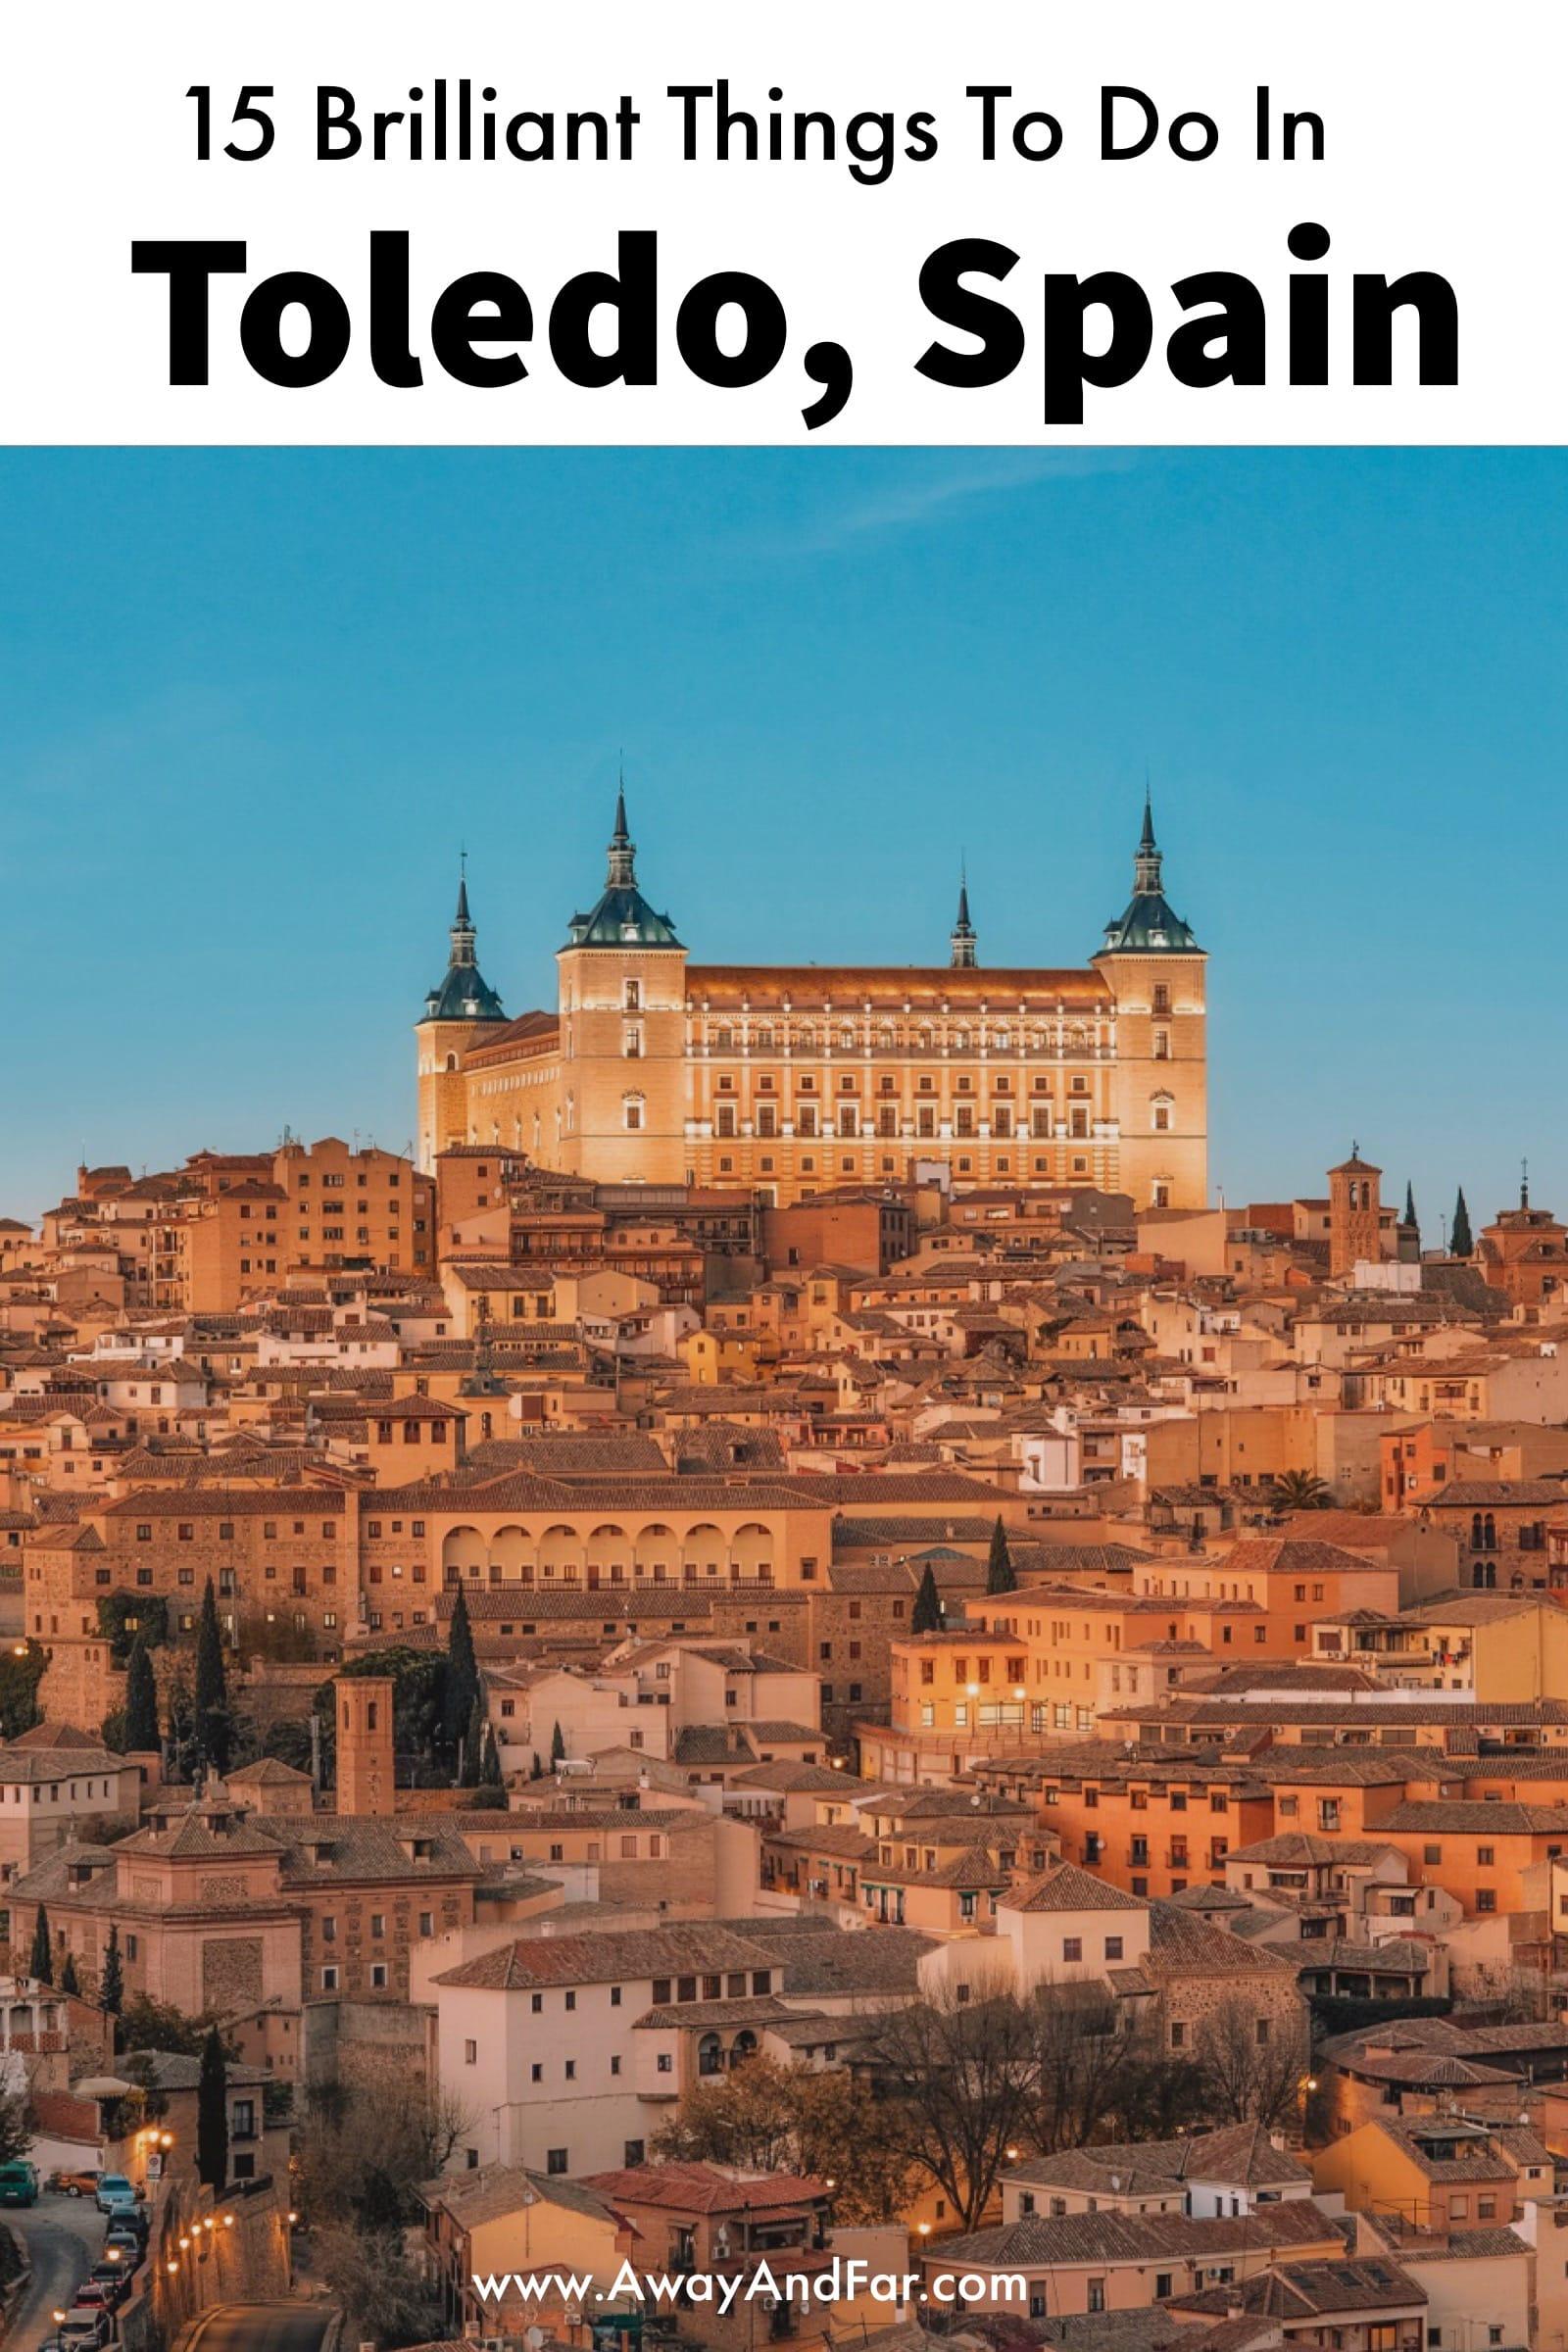 15 Best Things To Do In Toledo, Spain (1)